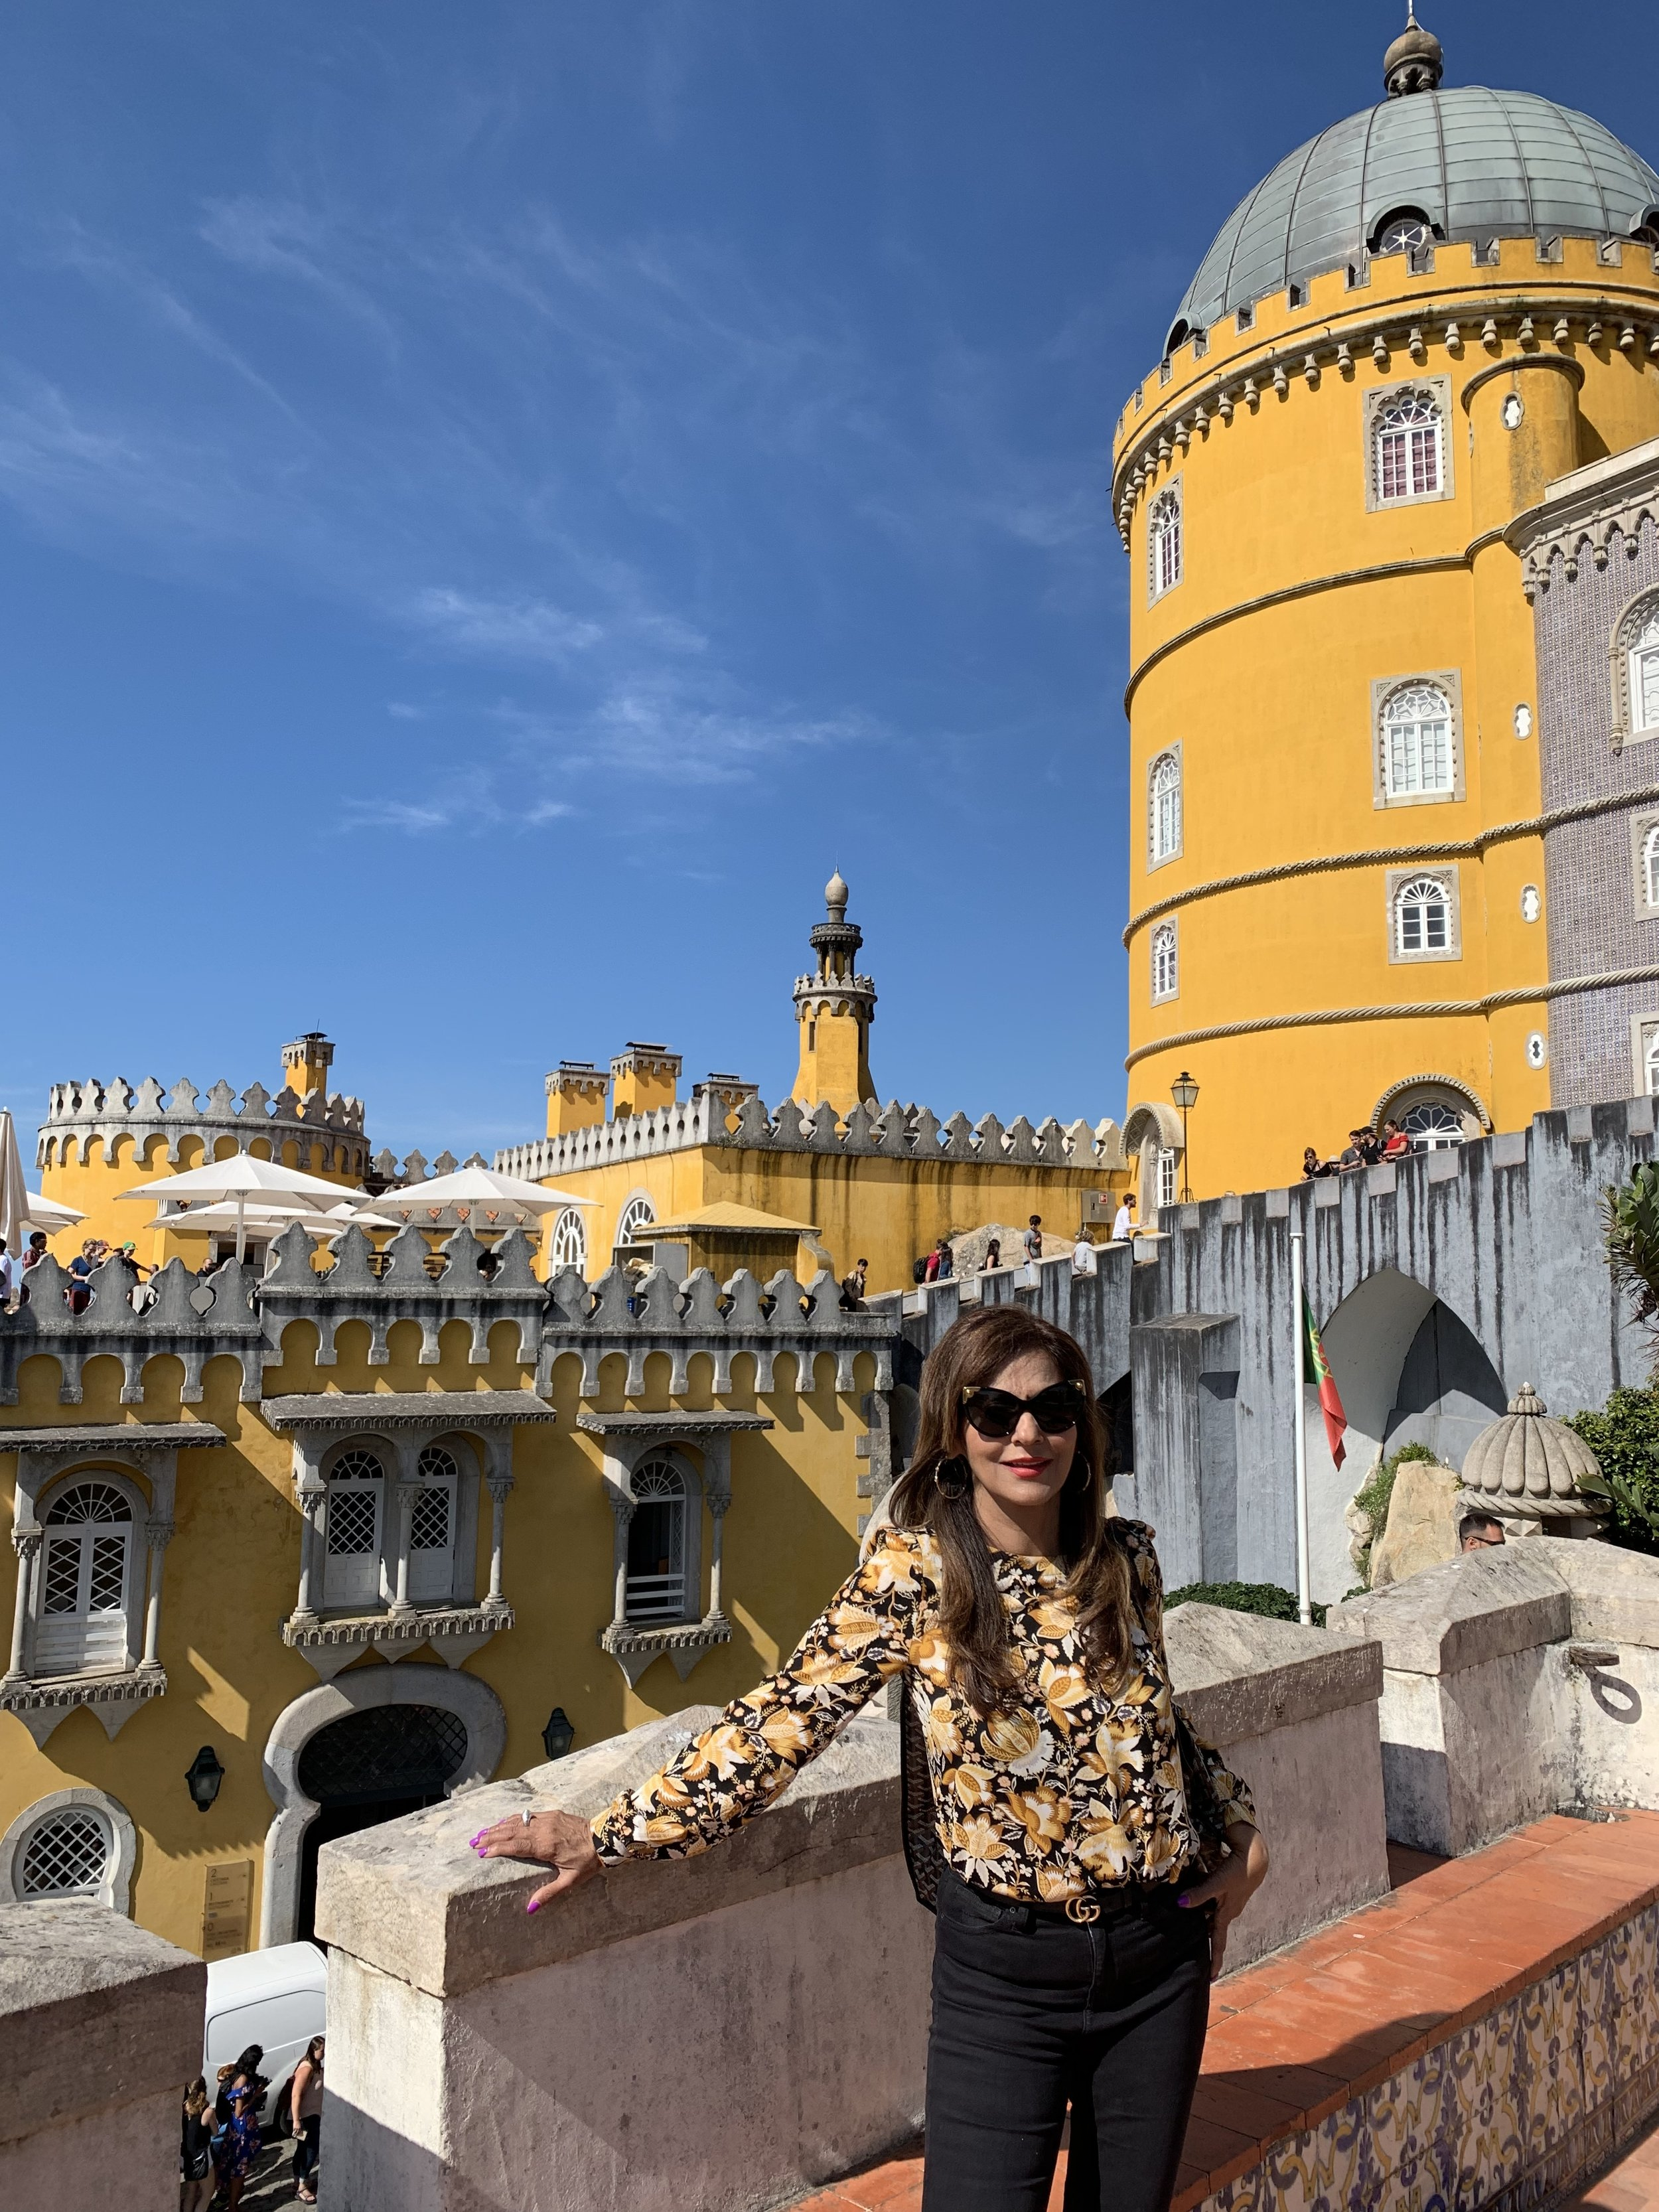 Palace Pena